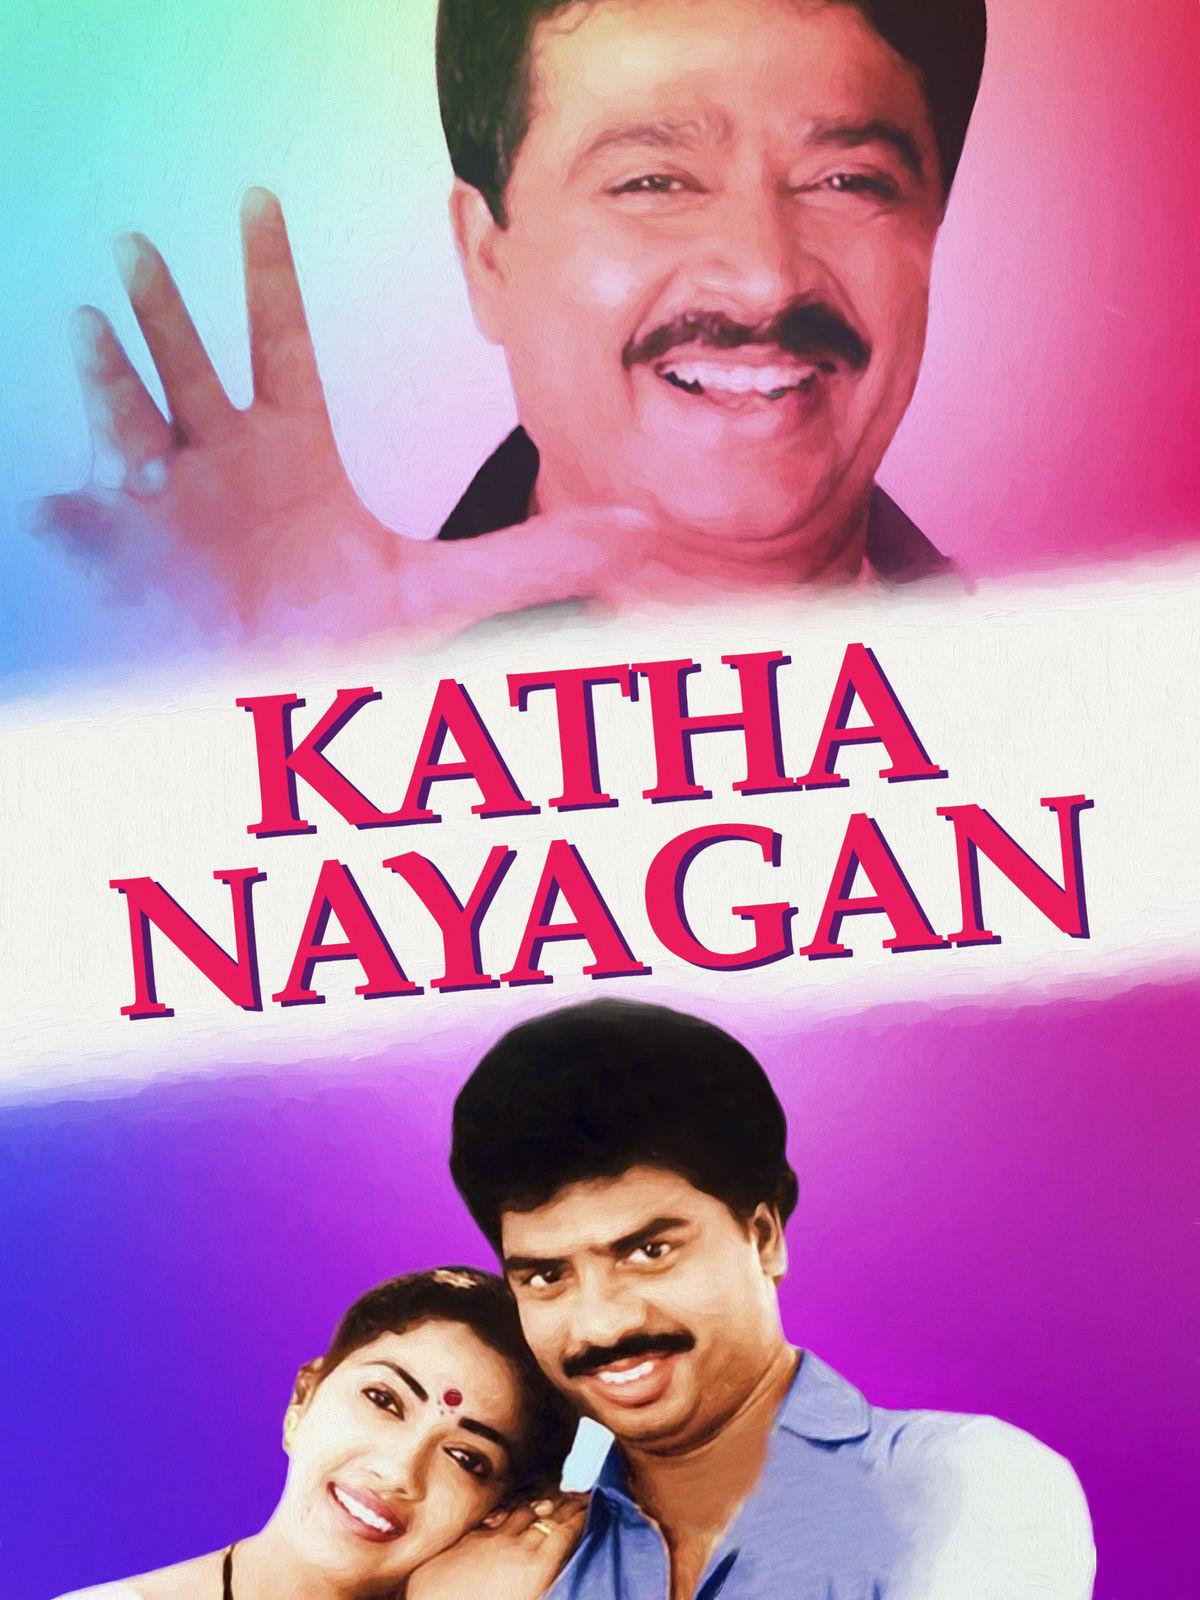 Kathanayagan